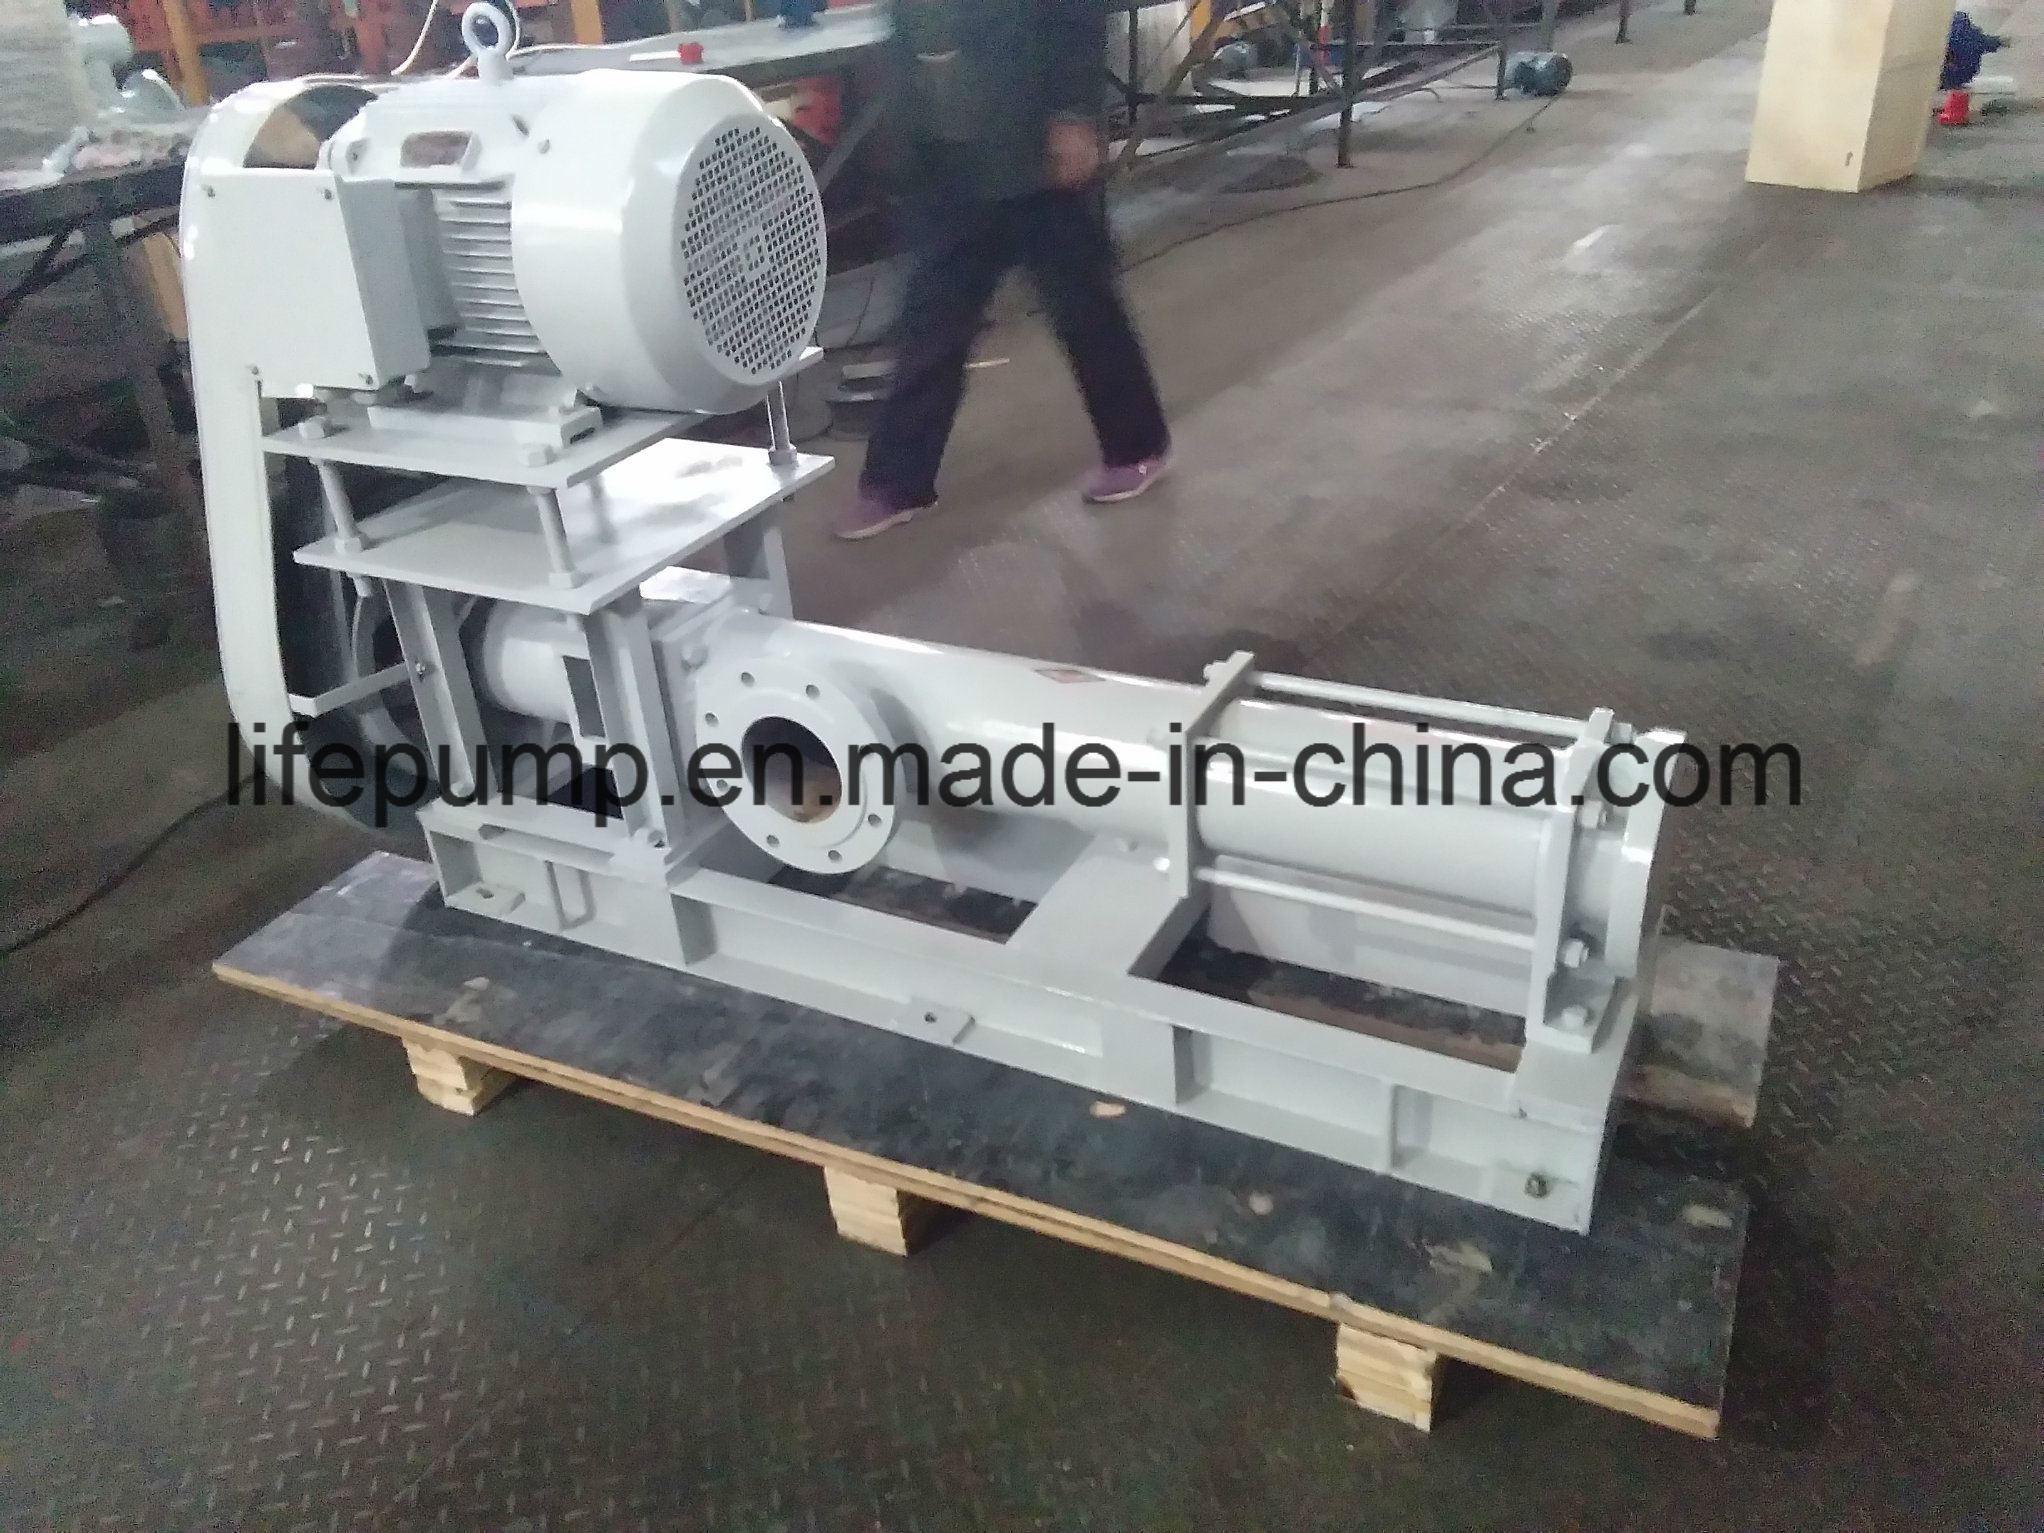 China Marine Fuel Pumps for MGO, Hfo and Lsfo Transfer Photos